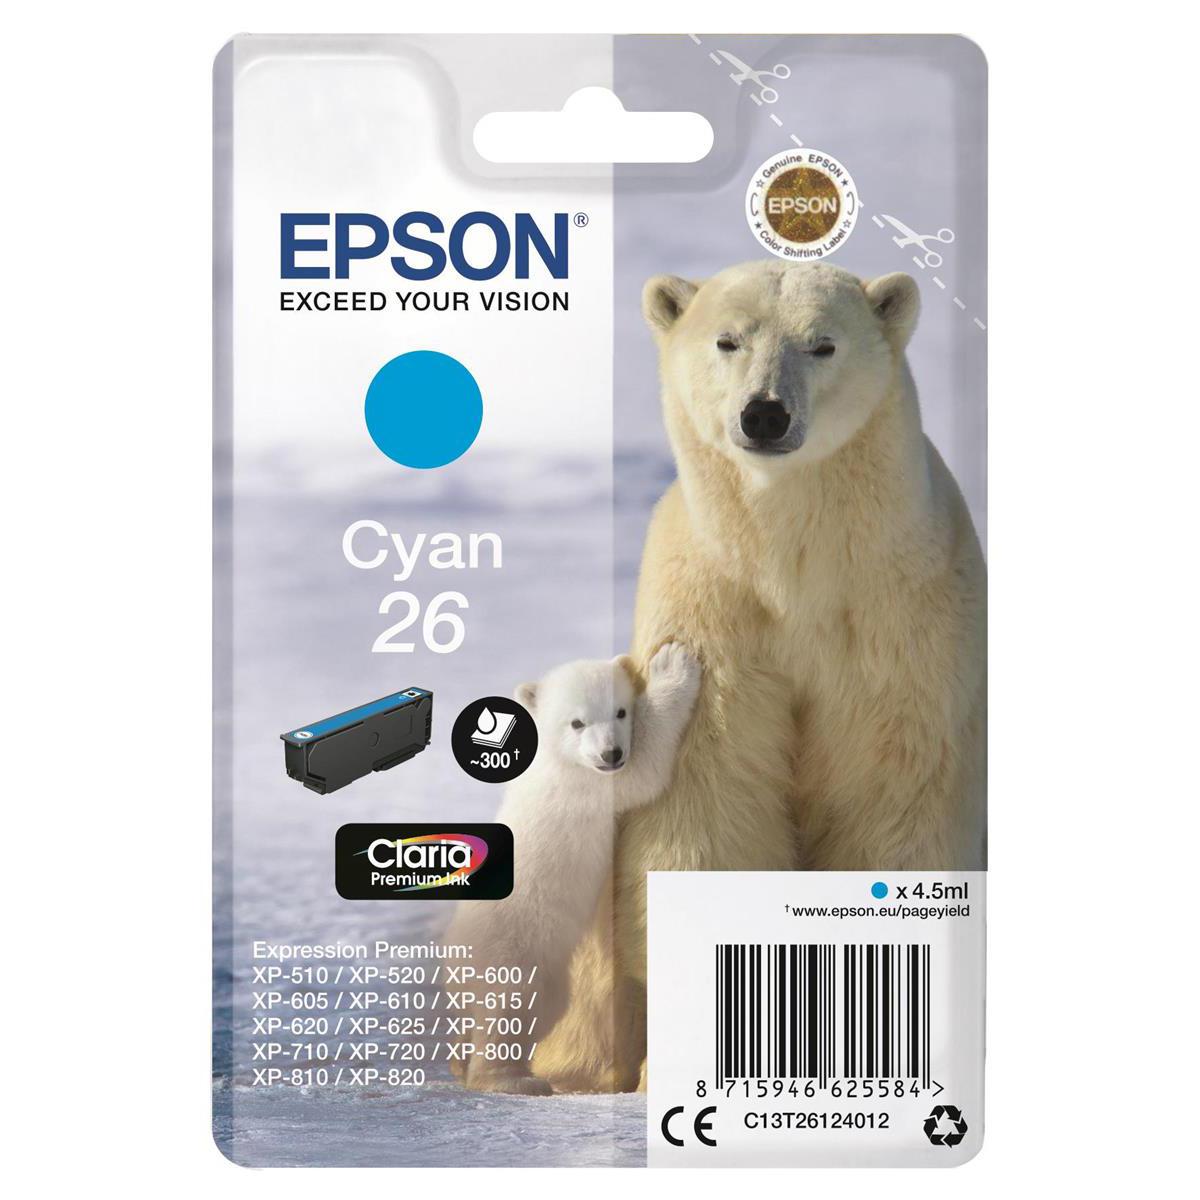 Epson 26 Inkjet Cartridge Polar Bear Page Life 300pp 4.5ml Cyan Ref C13T26124012